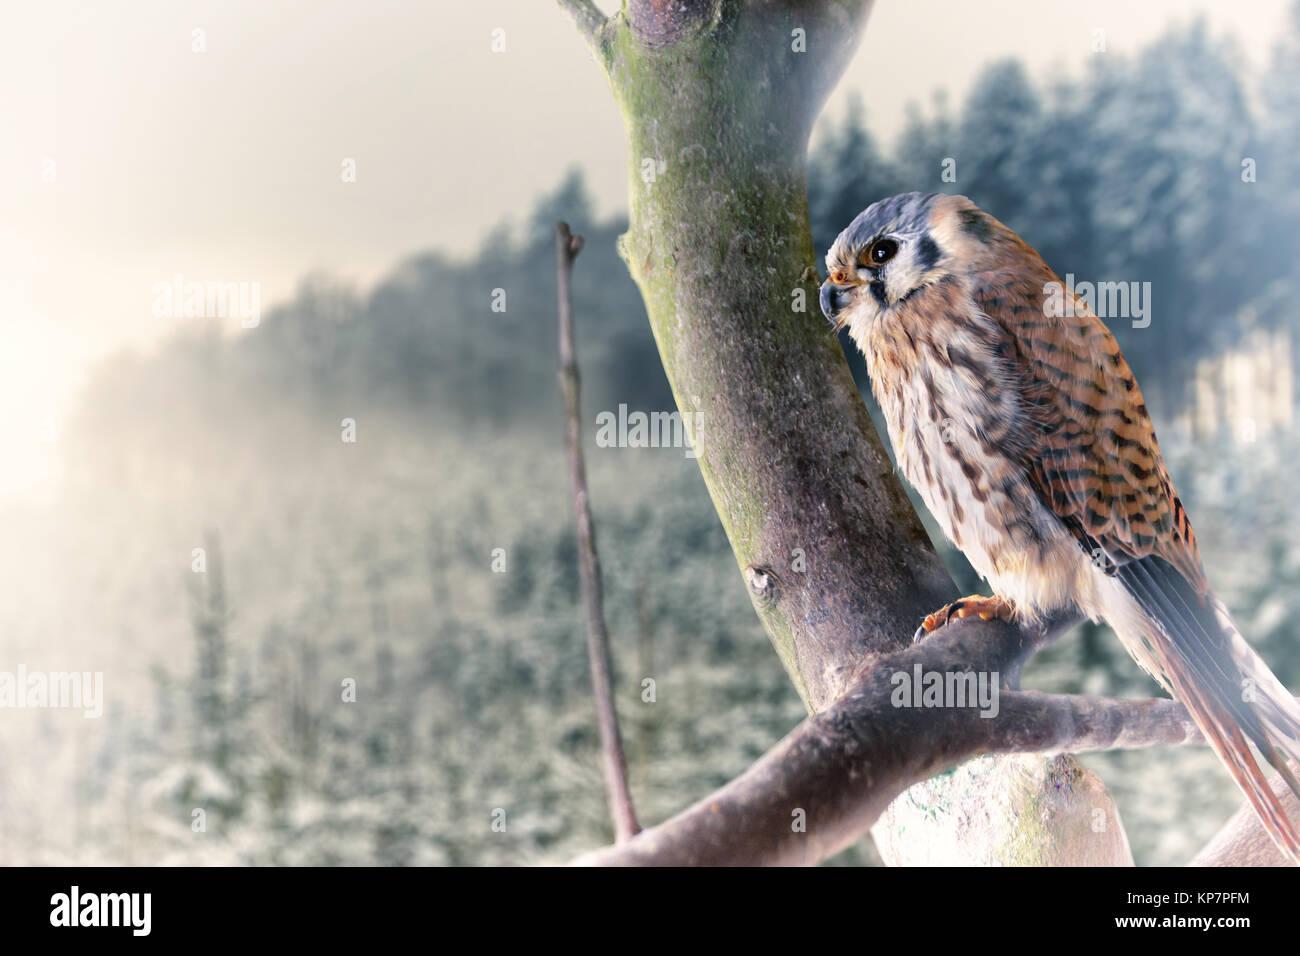 falke against snow forest winter scenery - Stock Image